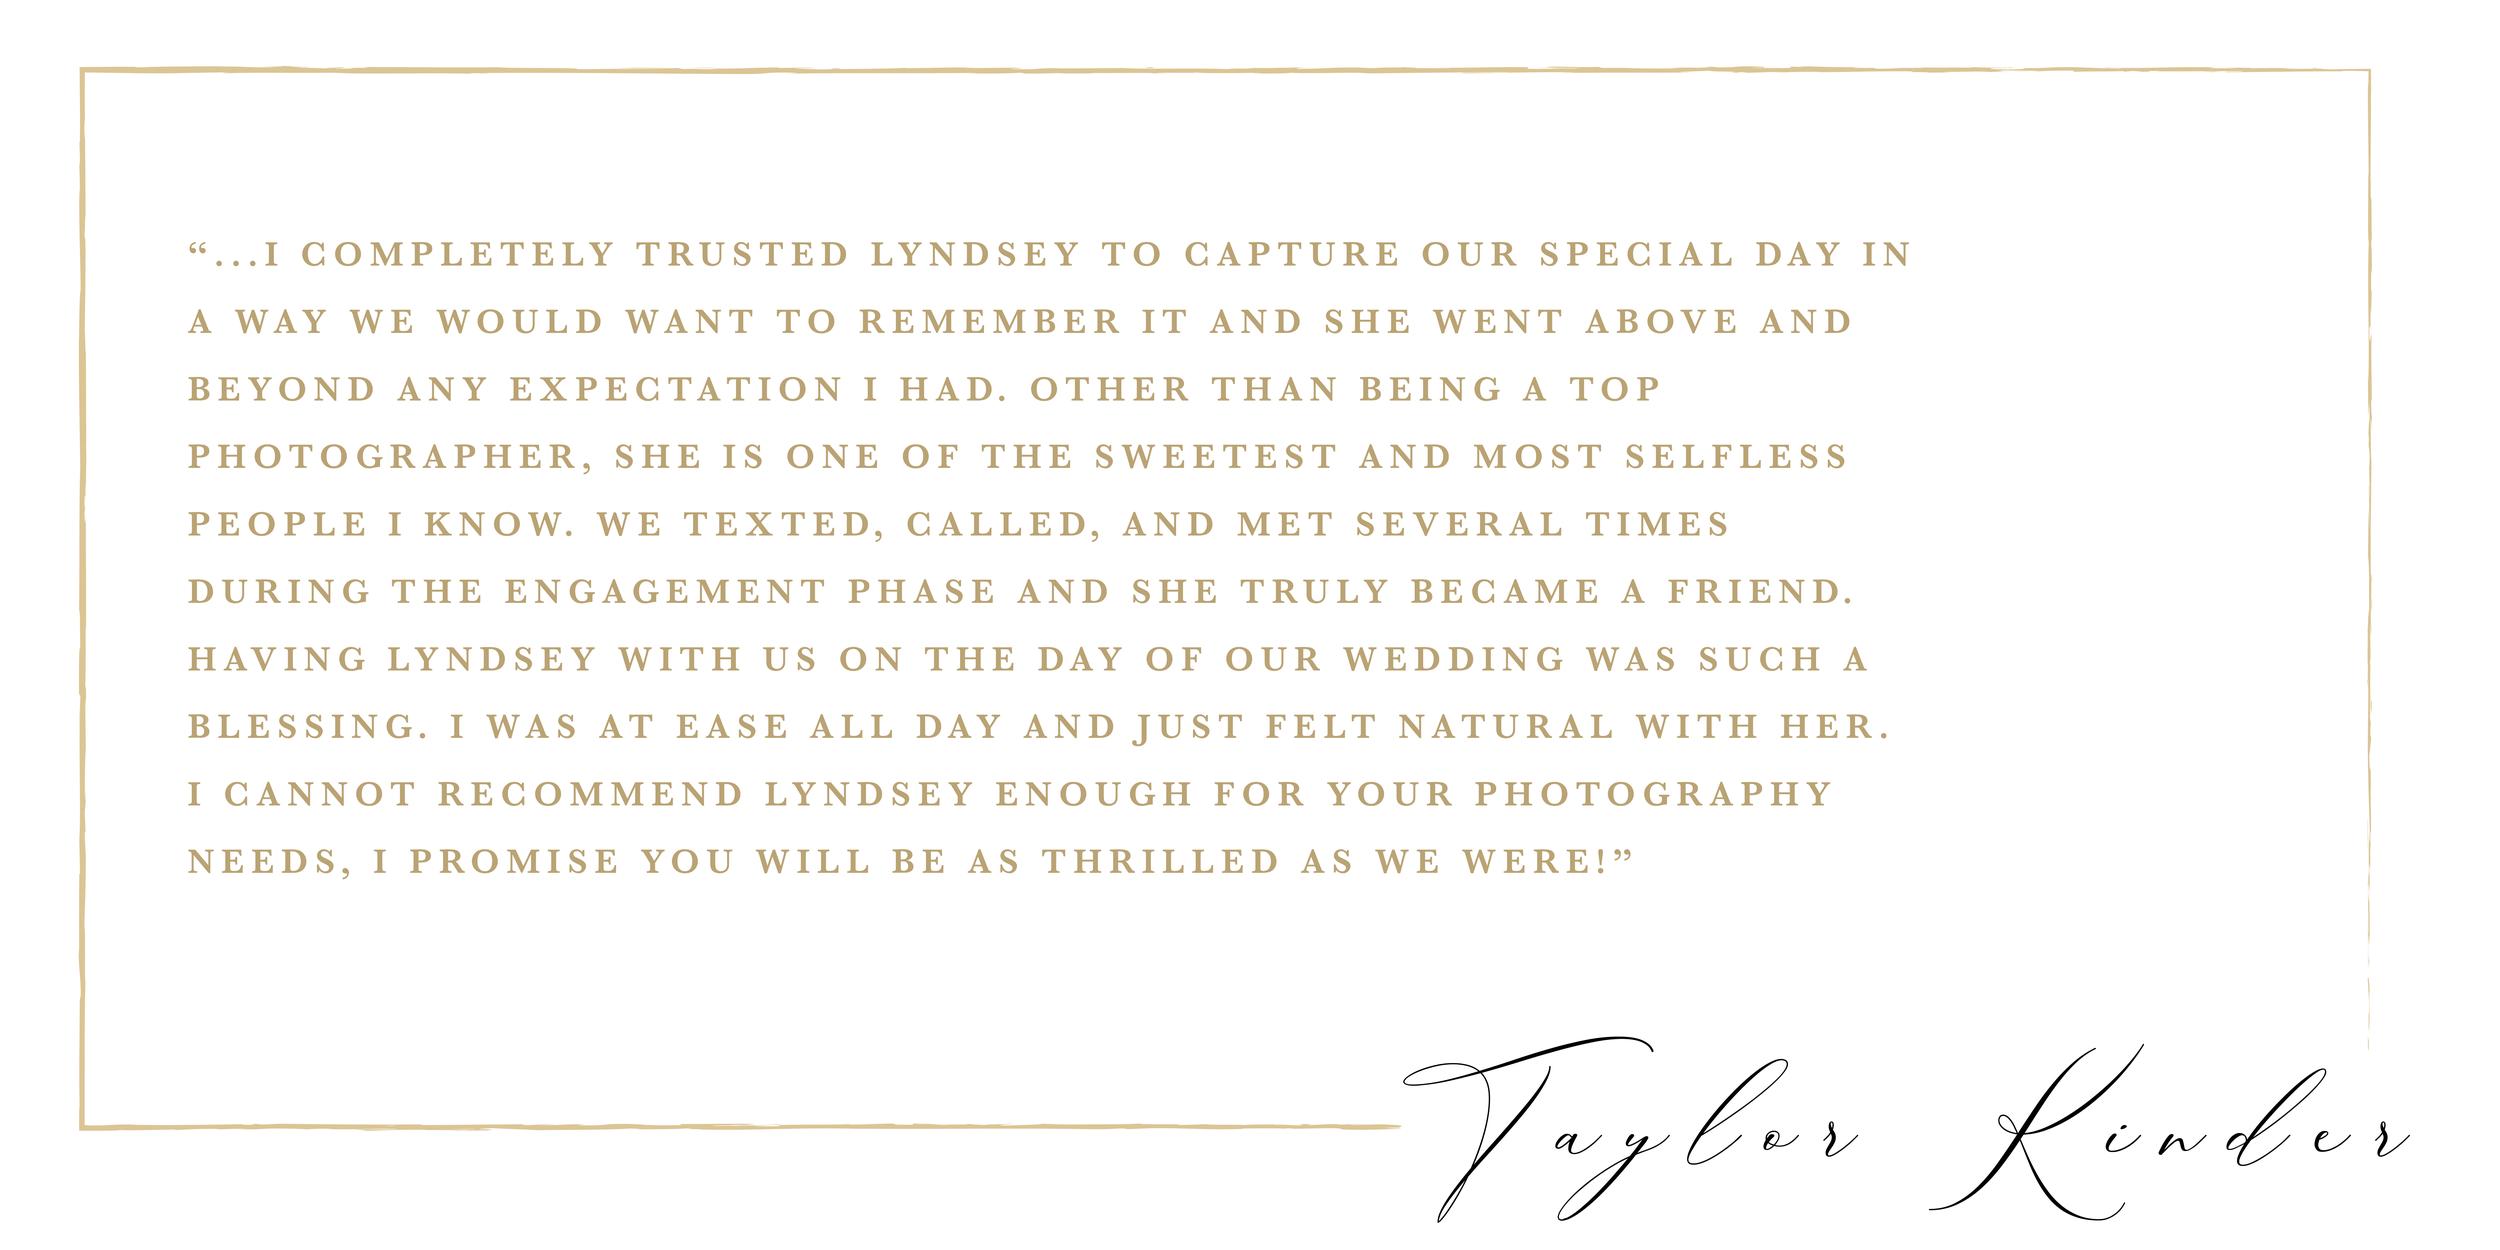 LyndseyTestimonialsTaylorKinder2-01.png